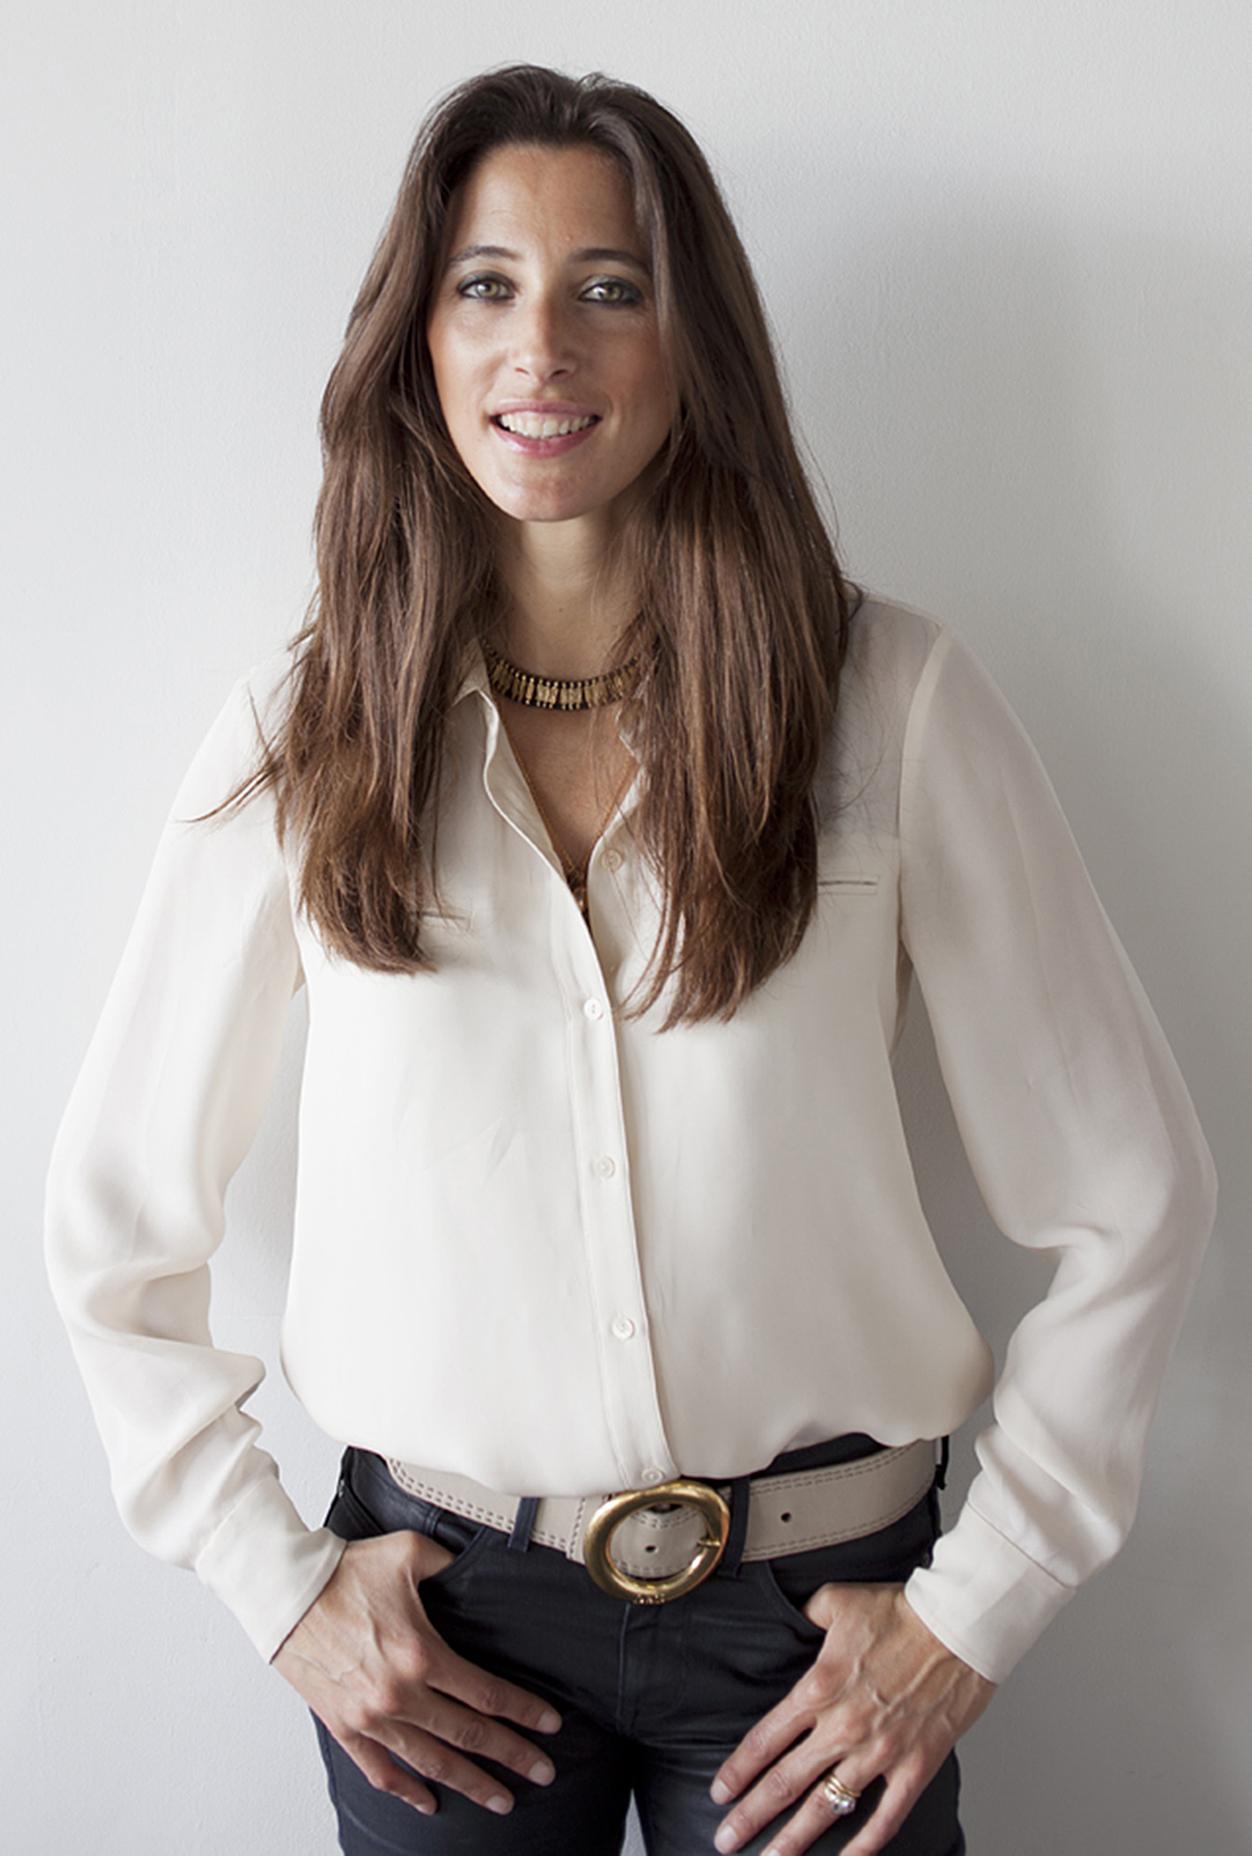 Chloe Macintosh, Creative Director at MADE.COM